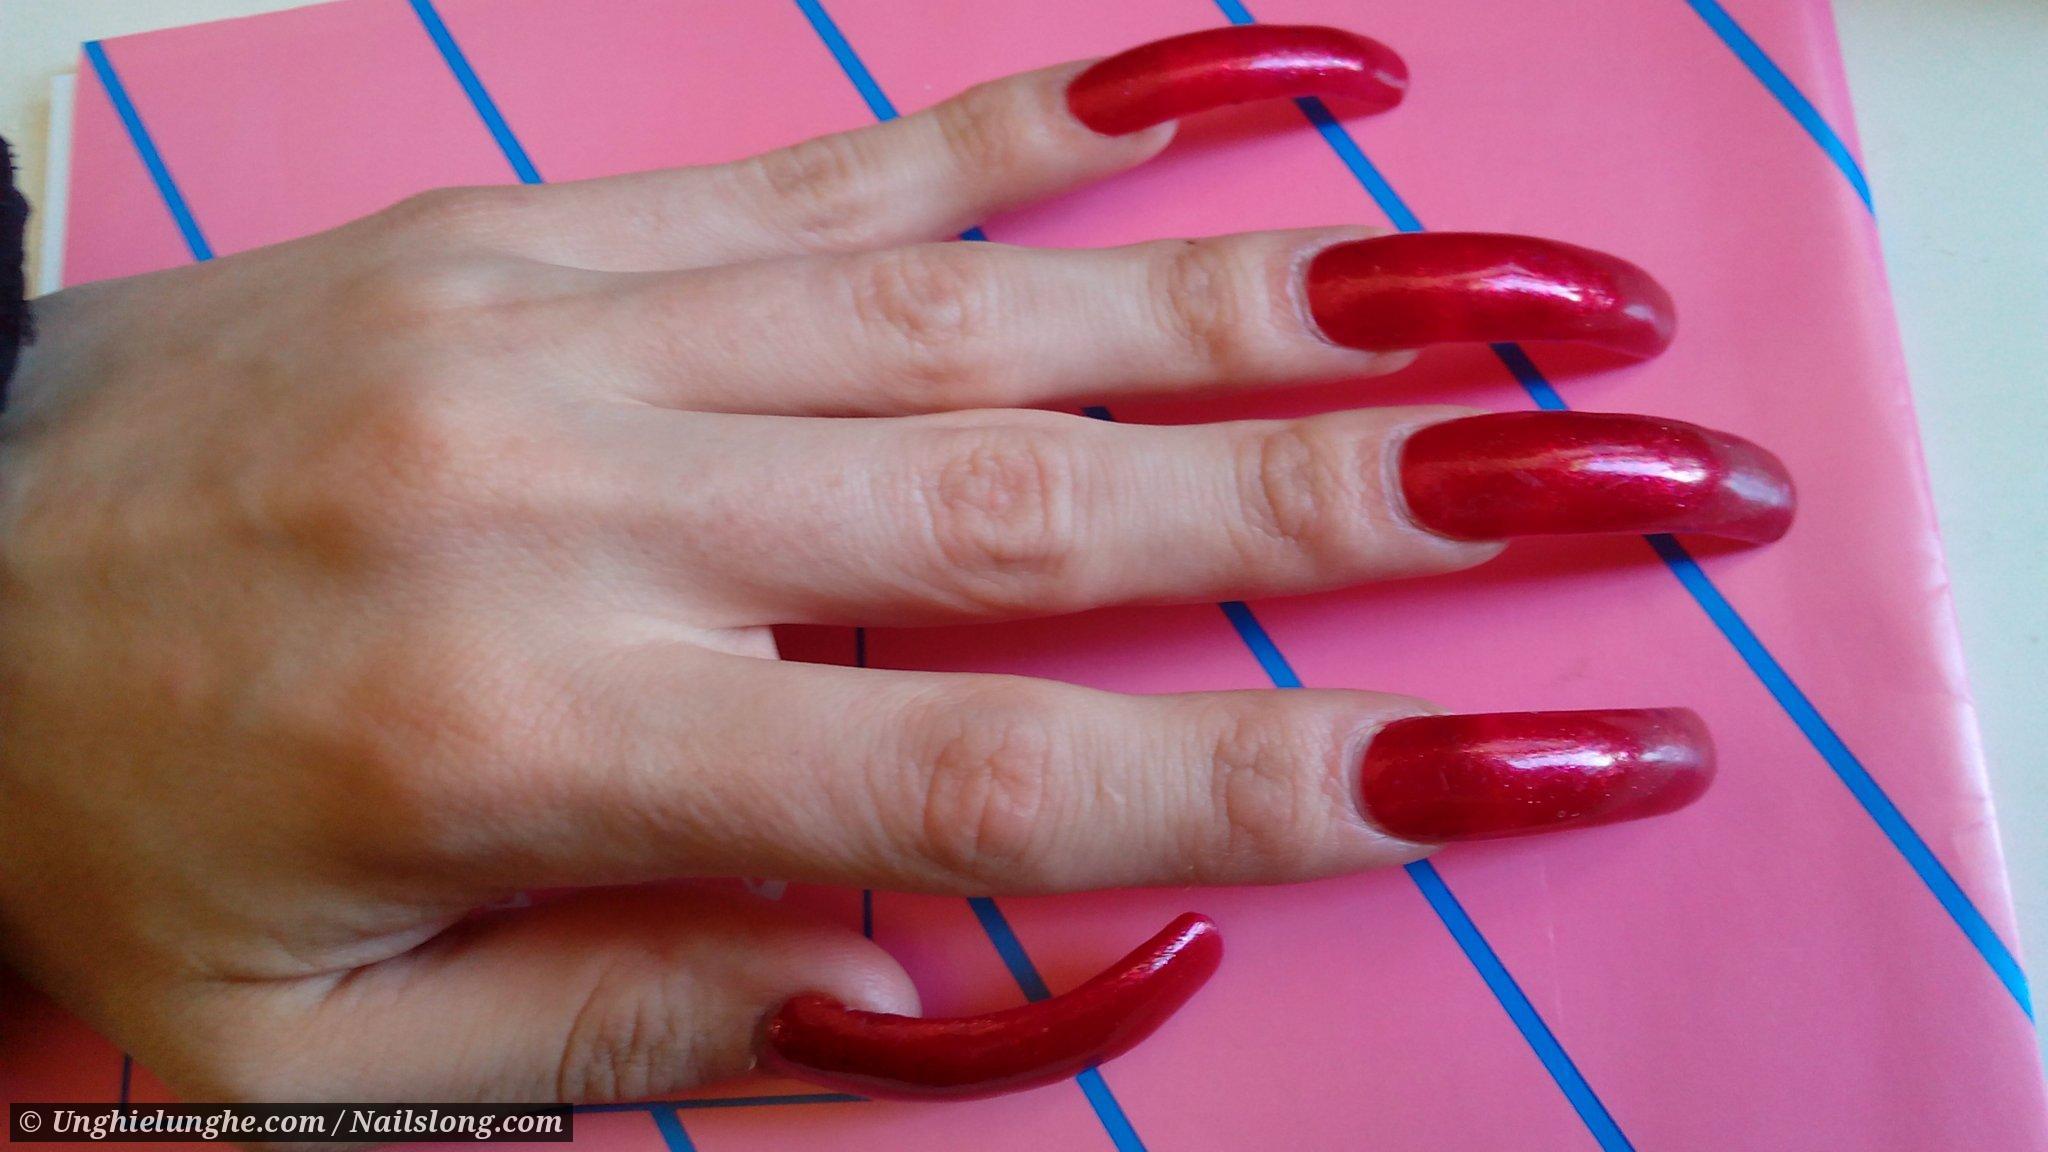 Фетиш ногти фото, Фетиш ногтей Форум 16 фотография